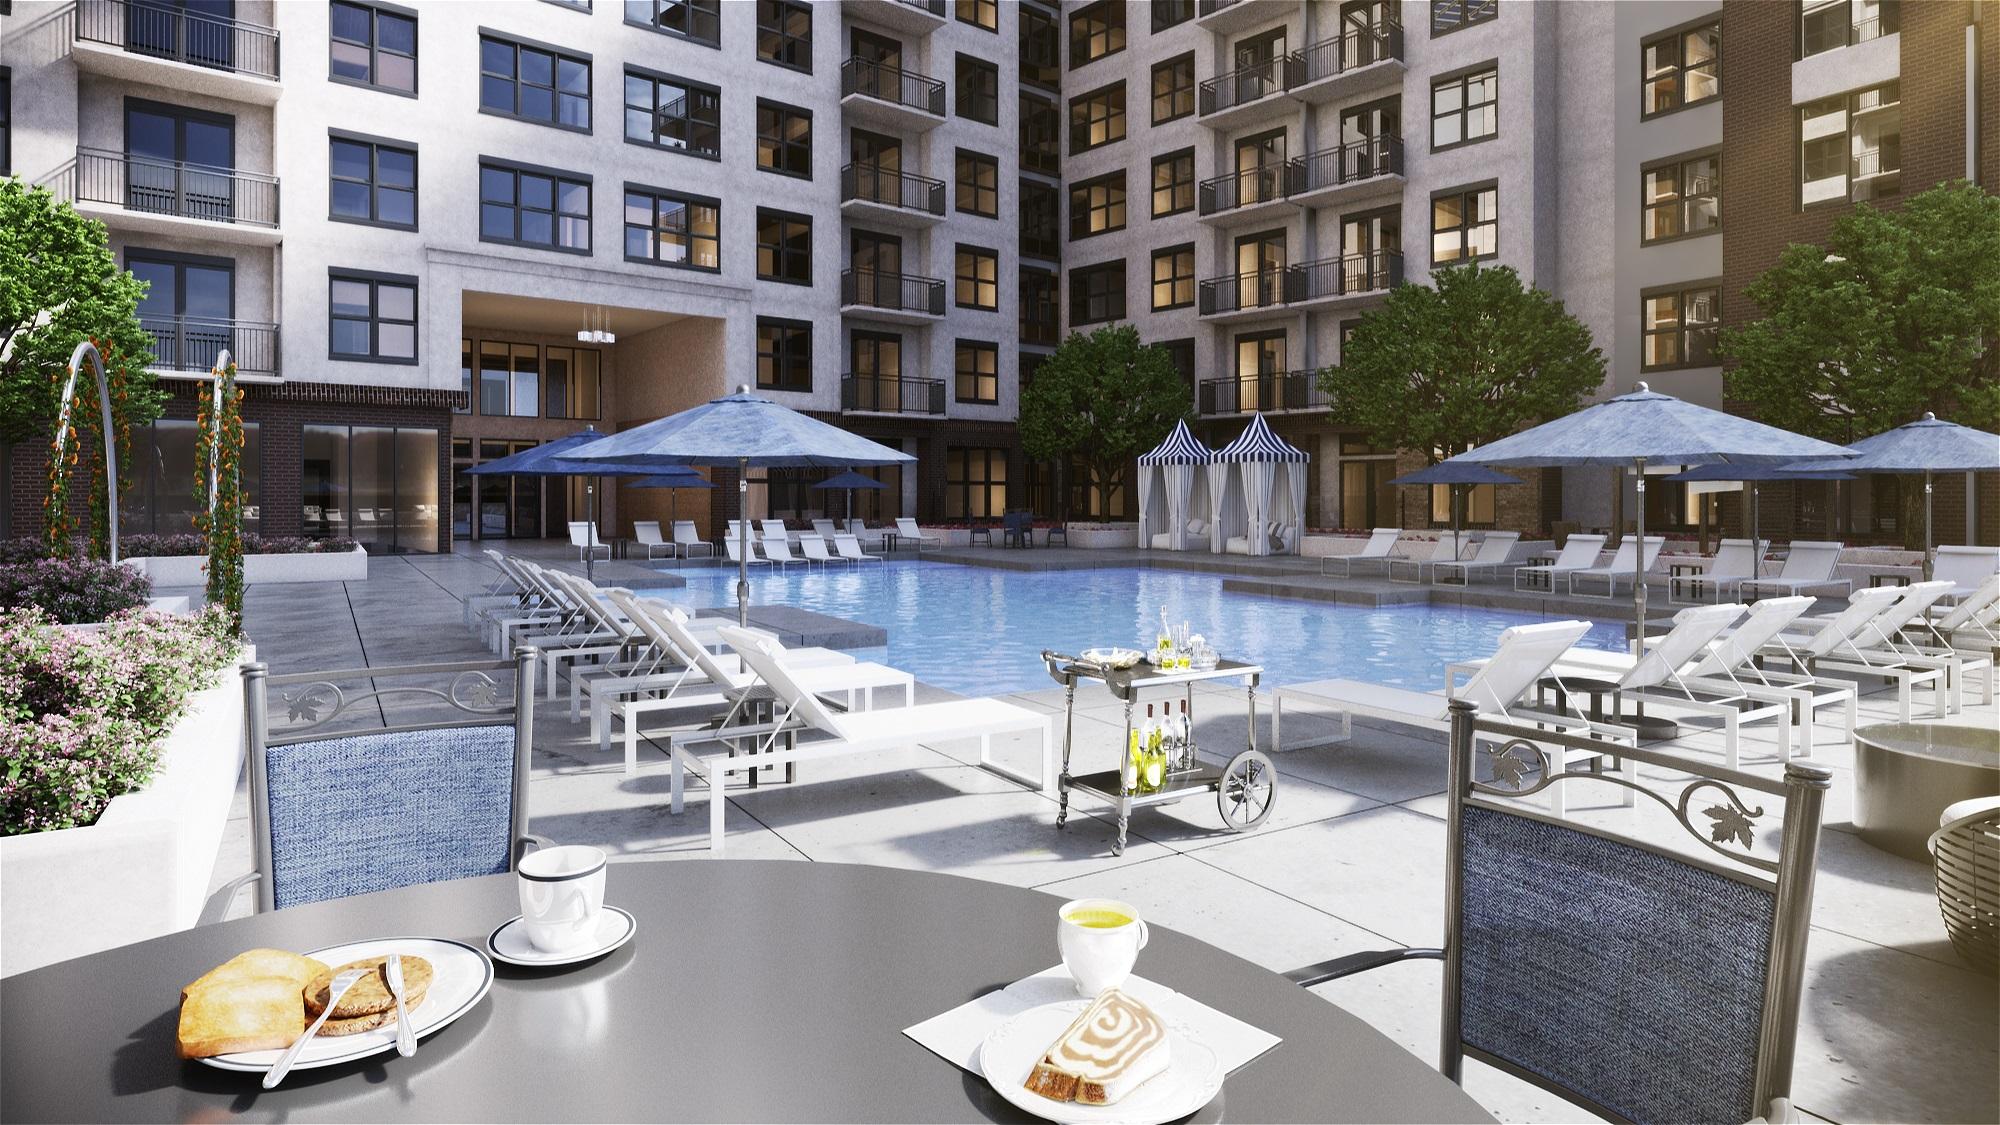 Gables Residential Announces Luxury Apartment Complex, The ...